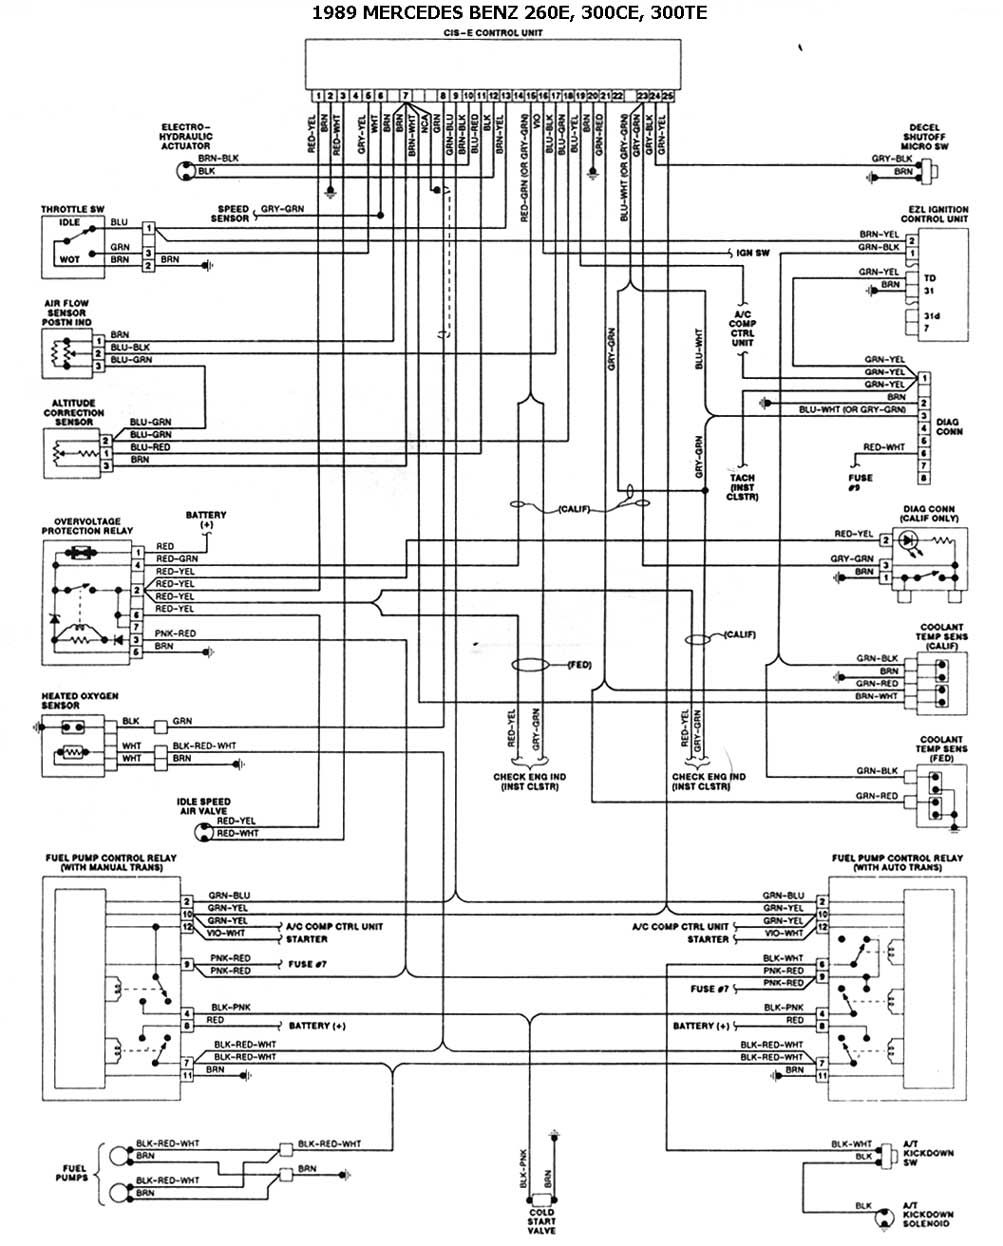 Sistema electrico mercedes 190